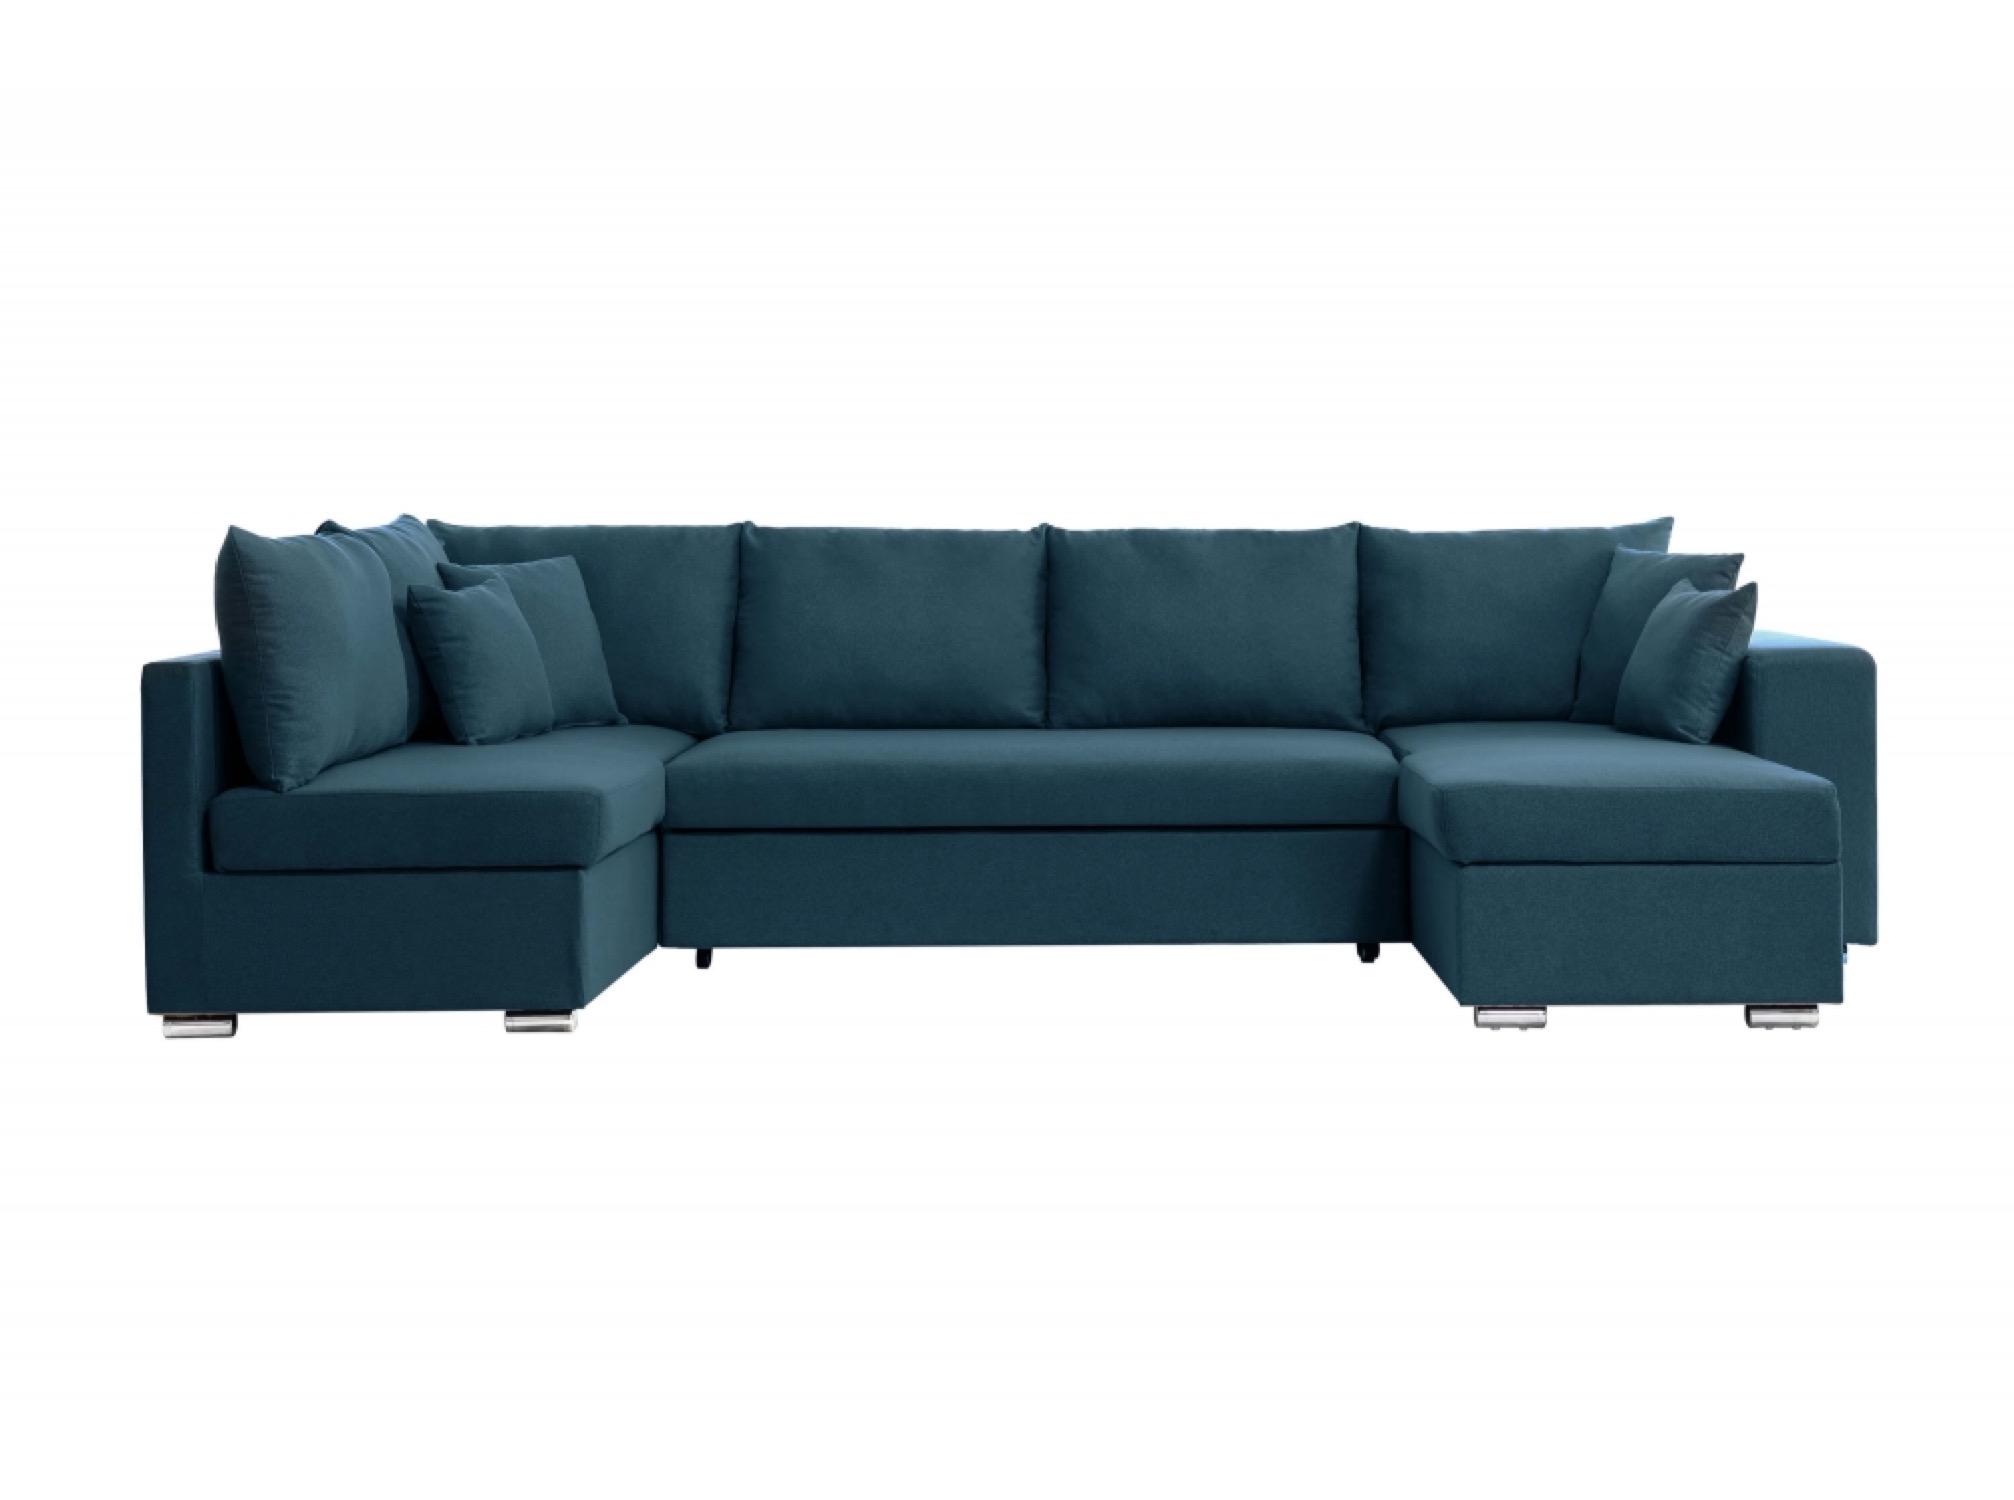 Canapé d'angle panoramique convertible 6 places en tissu bleu